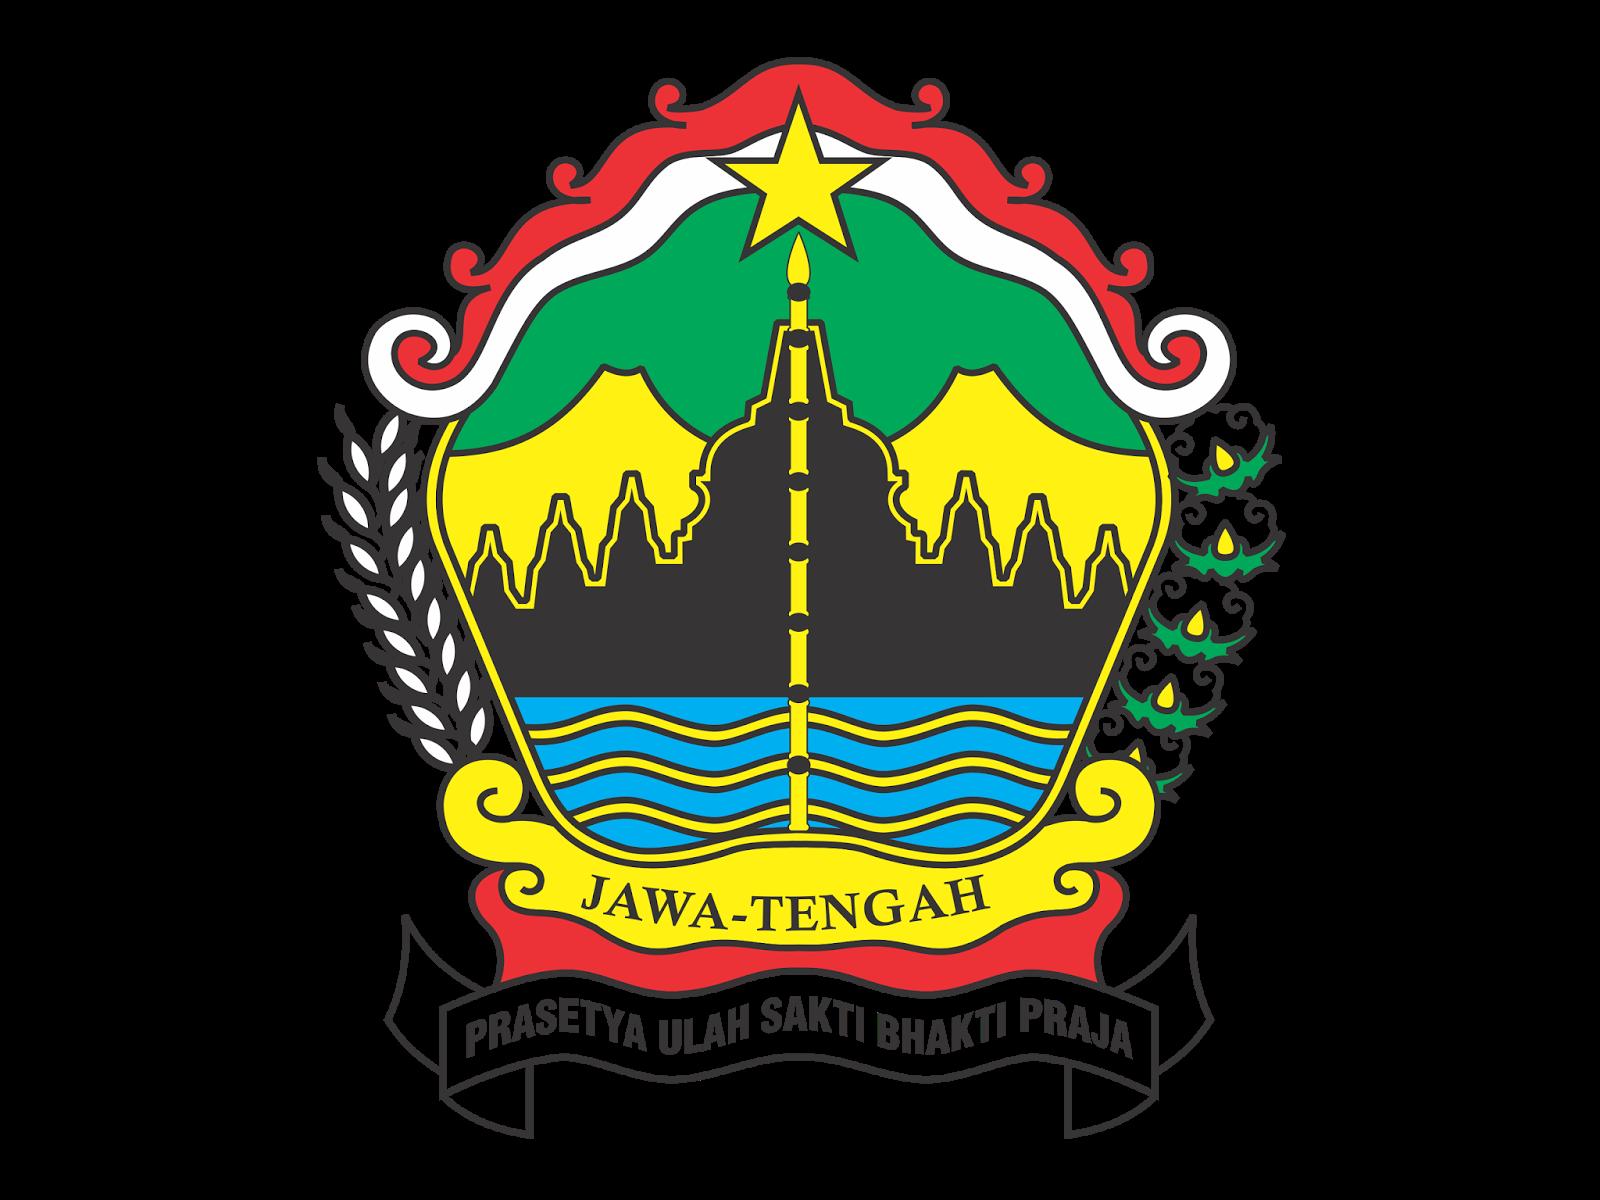 Bali Vector Download Logo Provinsi Jawa Tengah Png Hd